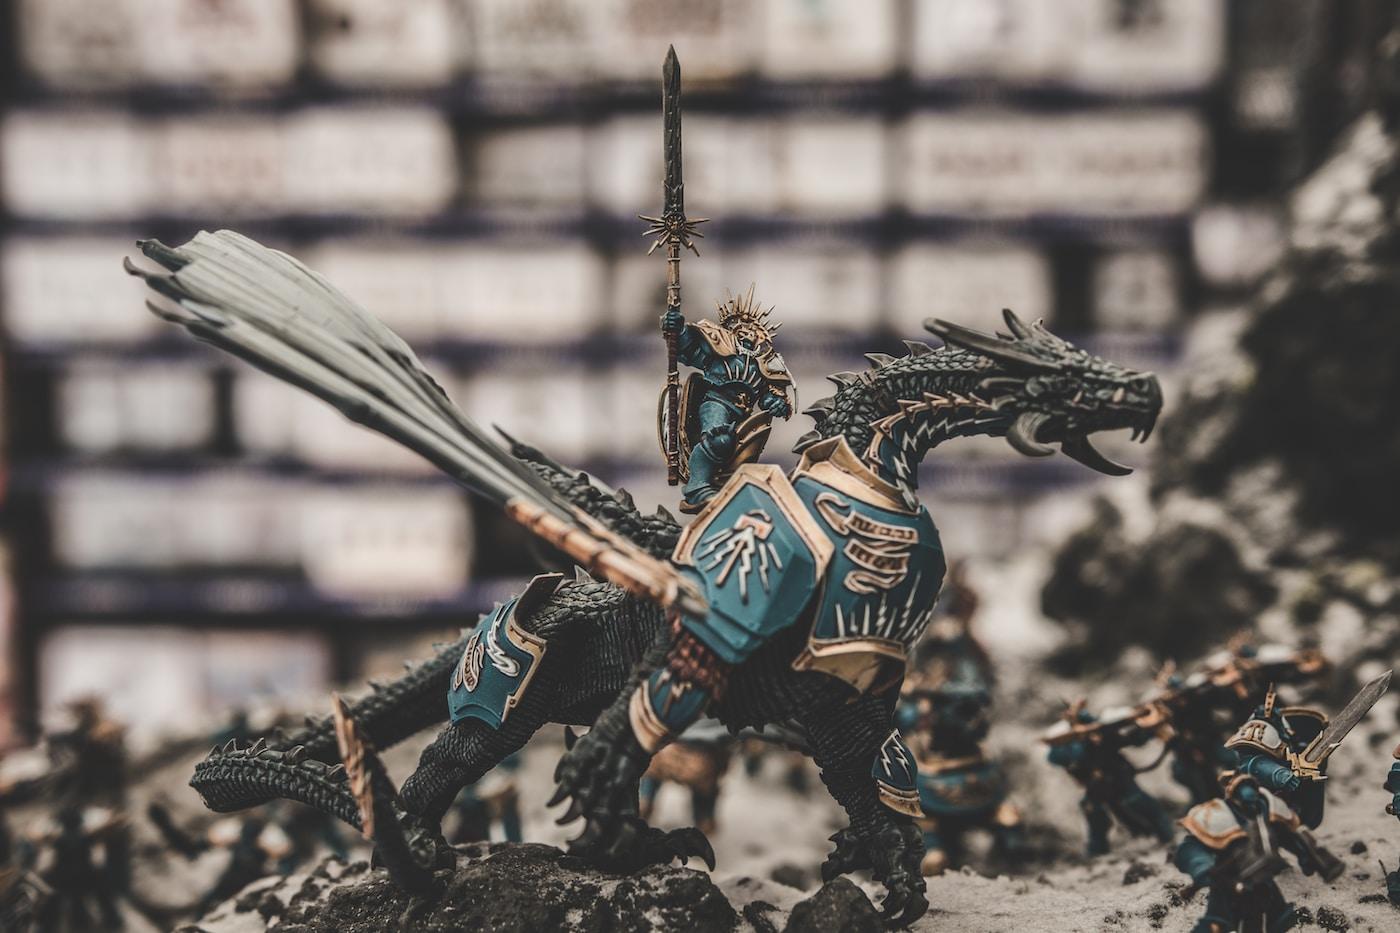 Algorismus. photo of knight riding dragon action figure